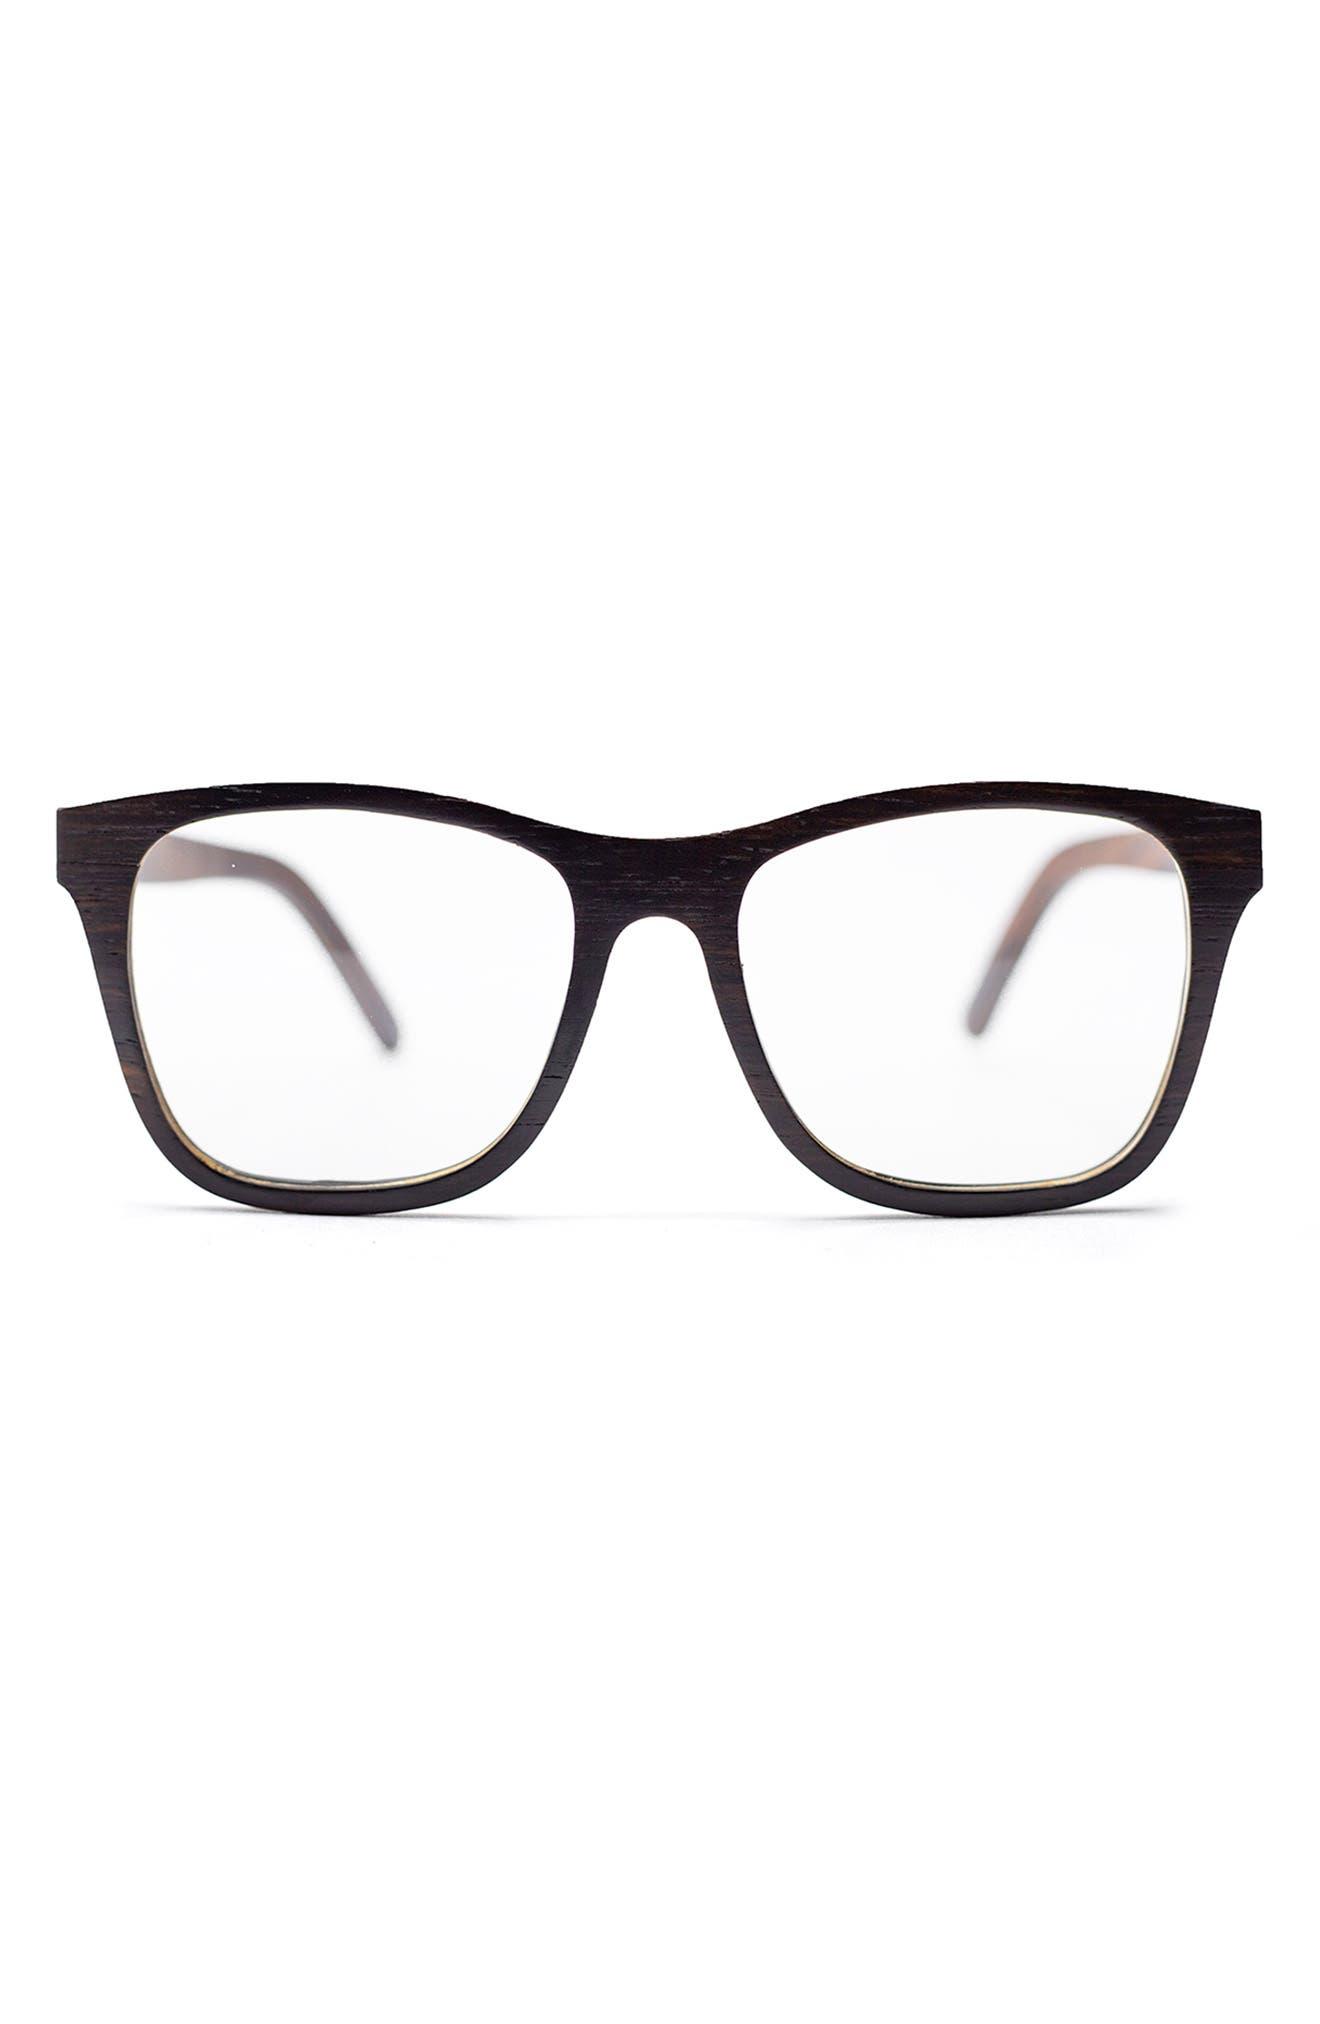 Barklae 50mm Square Blue Light Blocking Glasses